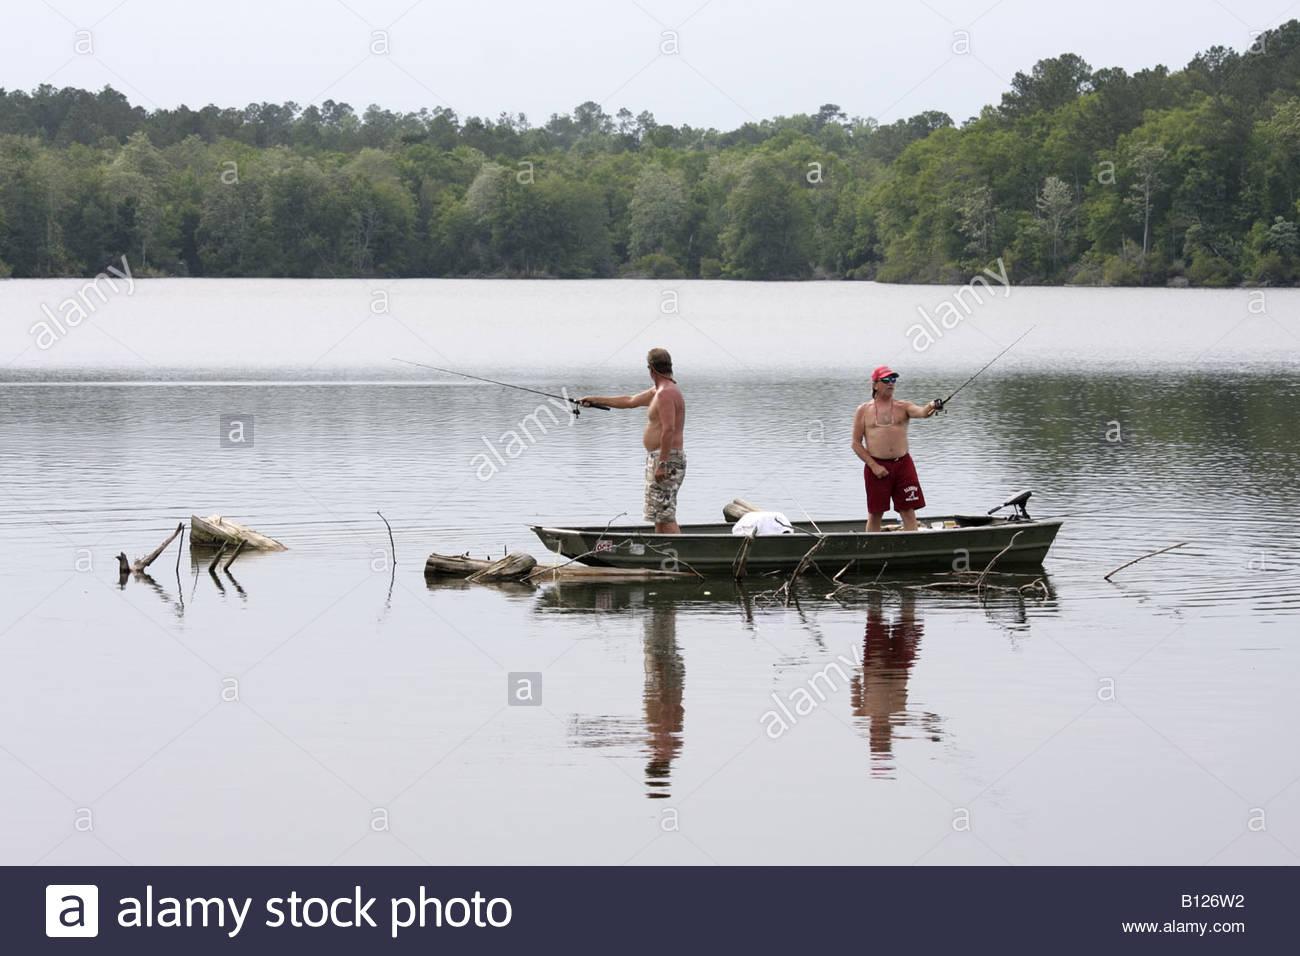 Freshwater fish in alabama - Alabama Millry Emmett Wood State Lake Fishing Man Men Boat Freshwater Fish Rod Reel Catch Angler Water Sport Recreation